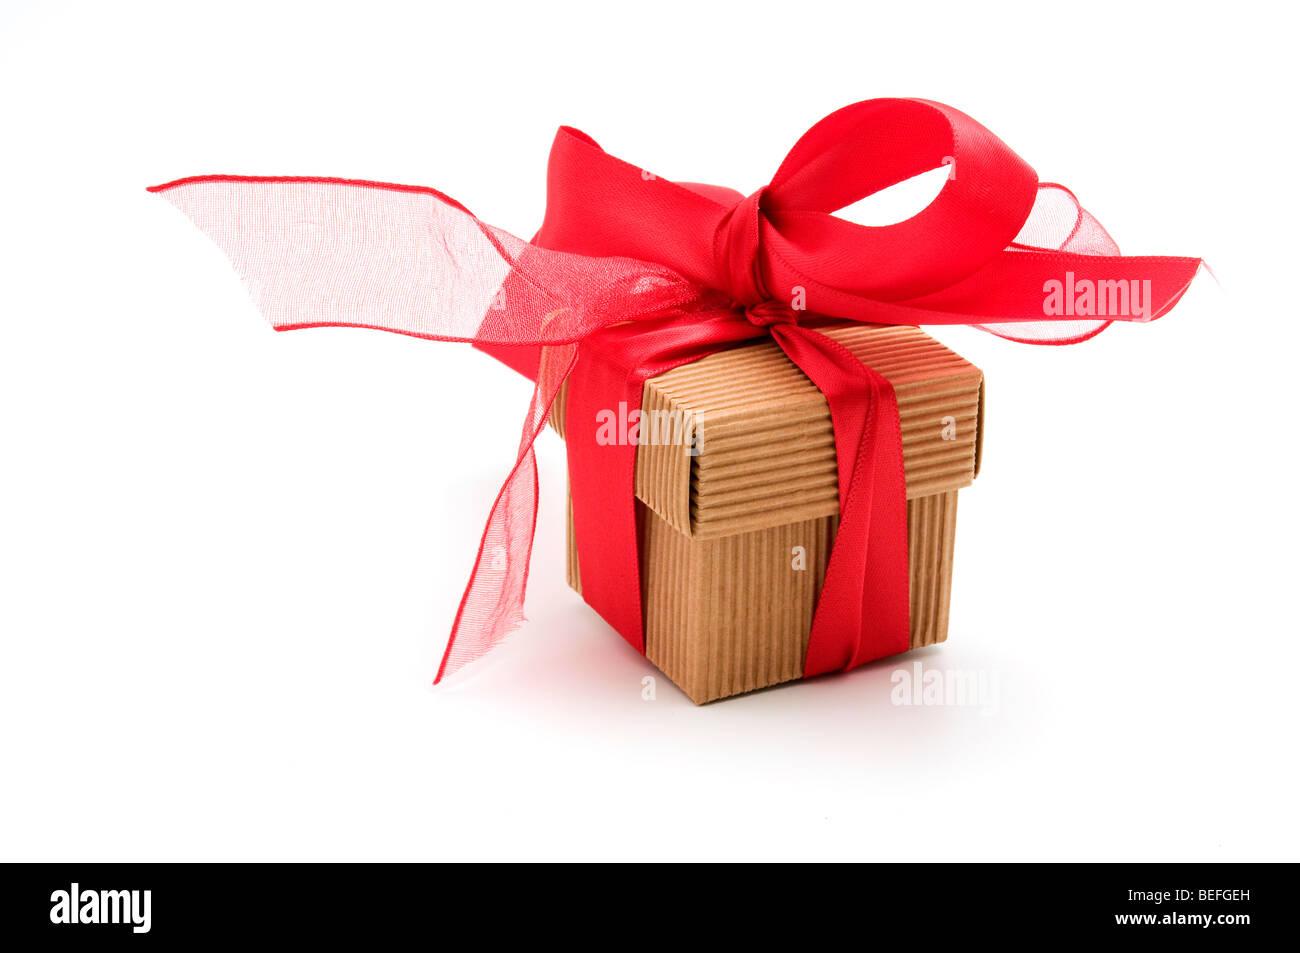 Caja de regalo sobre un fondo blanco. Imagen De Stock